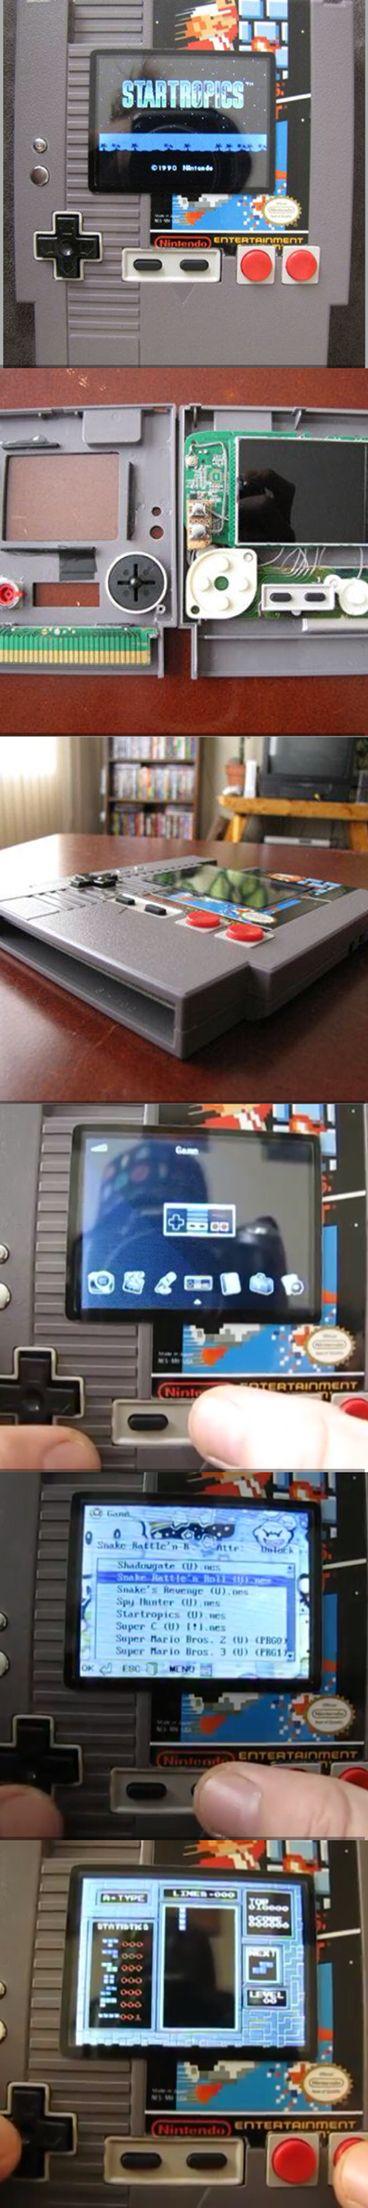 NES cartridge emulator NES custom NES mod Retro games